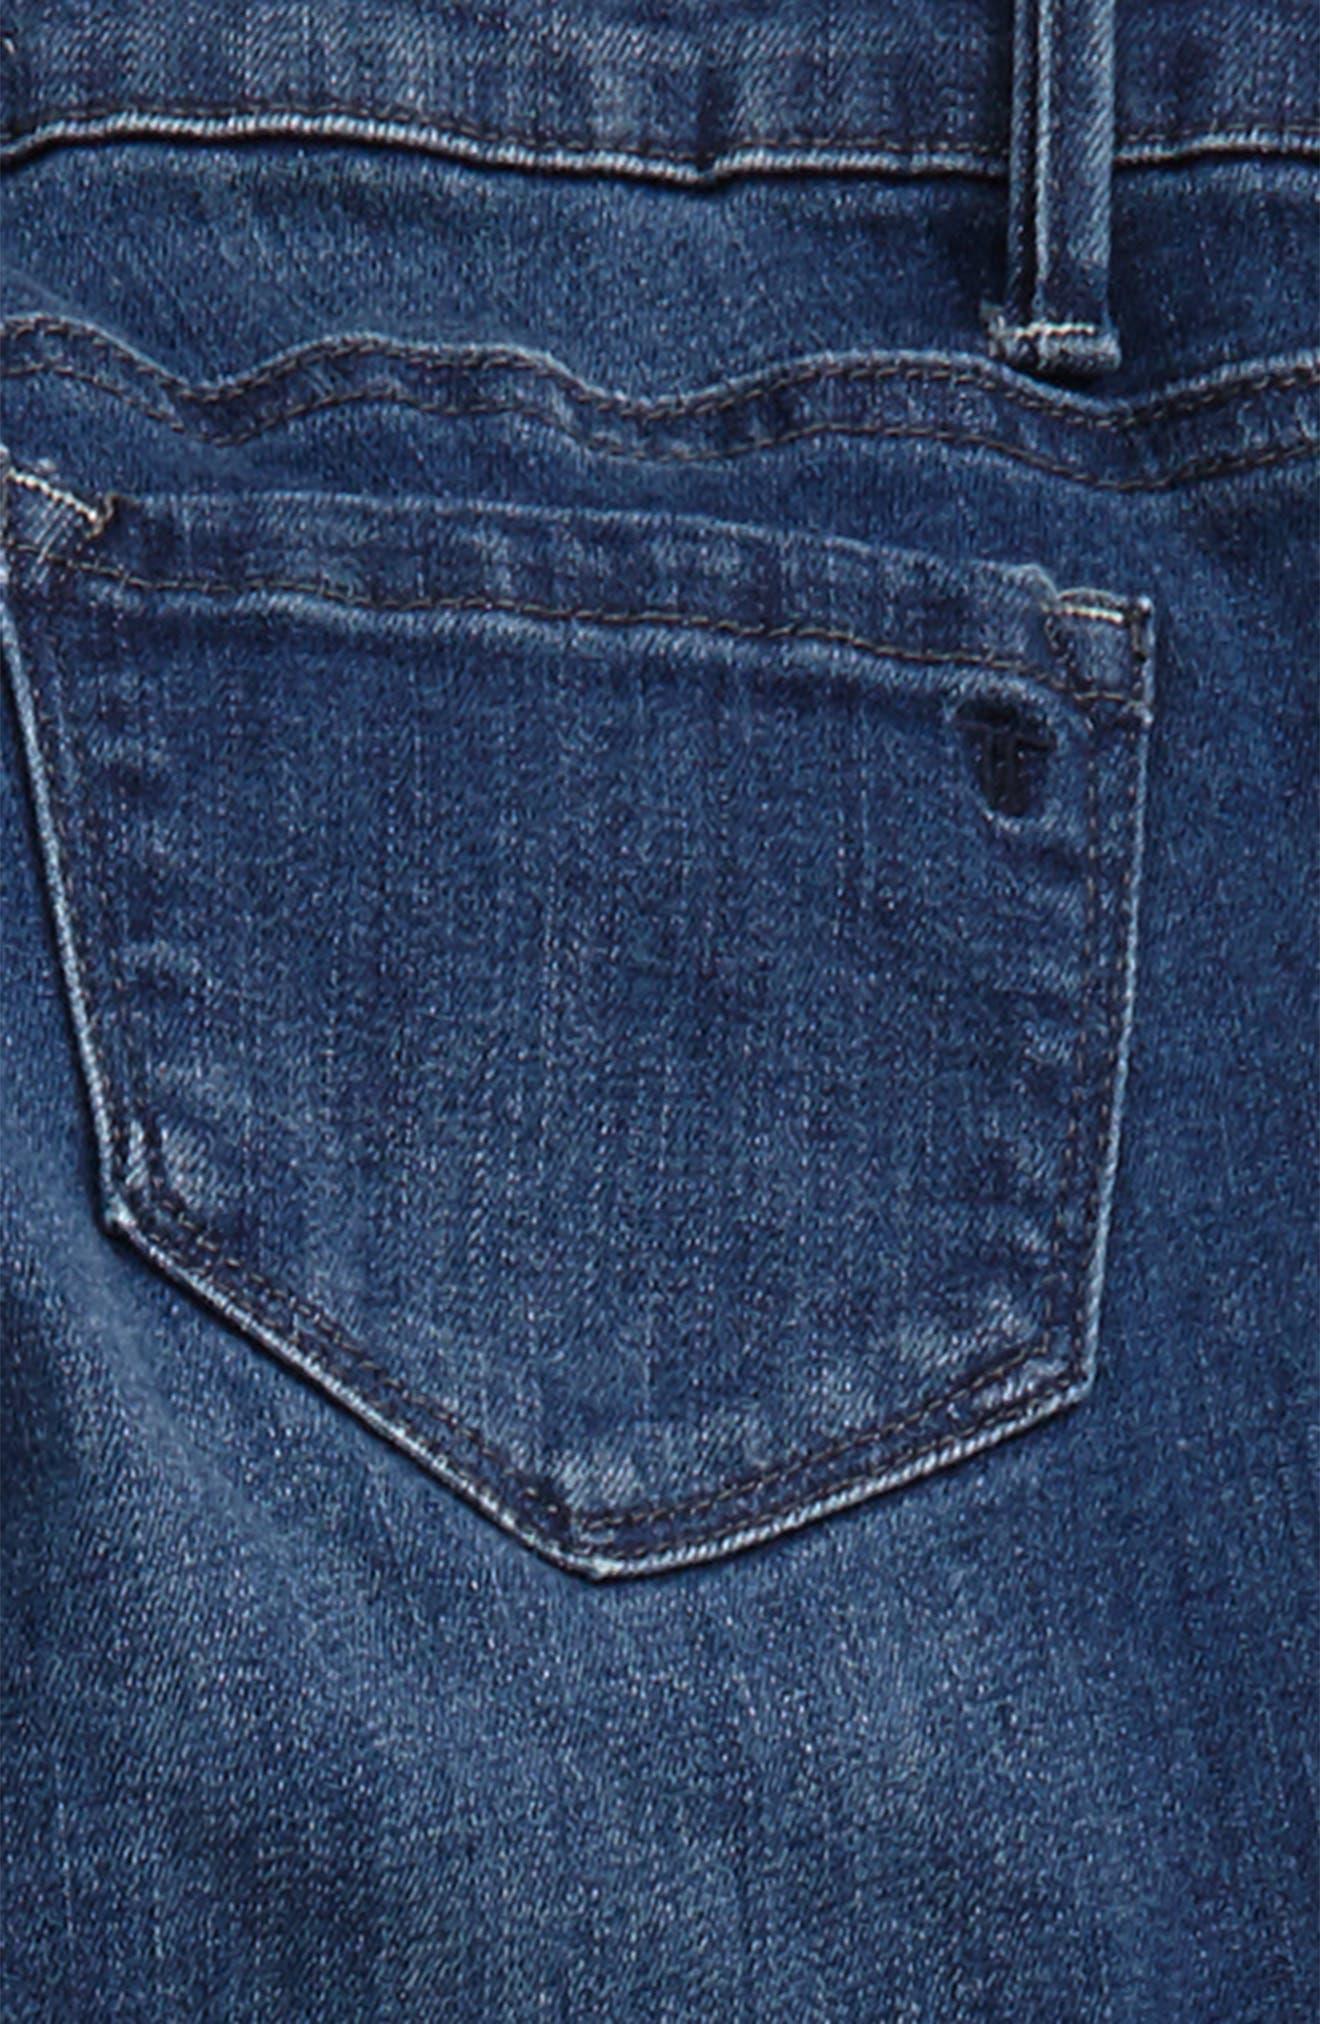 Alternate Image 3  - Tractr Frayed Hem Crop Jeans (Big Girls)